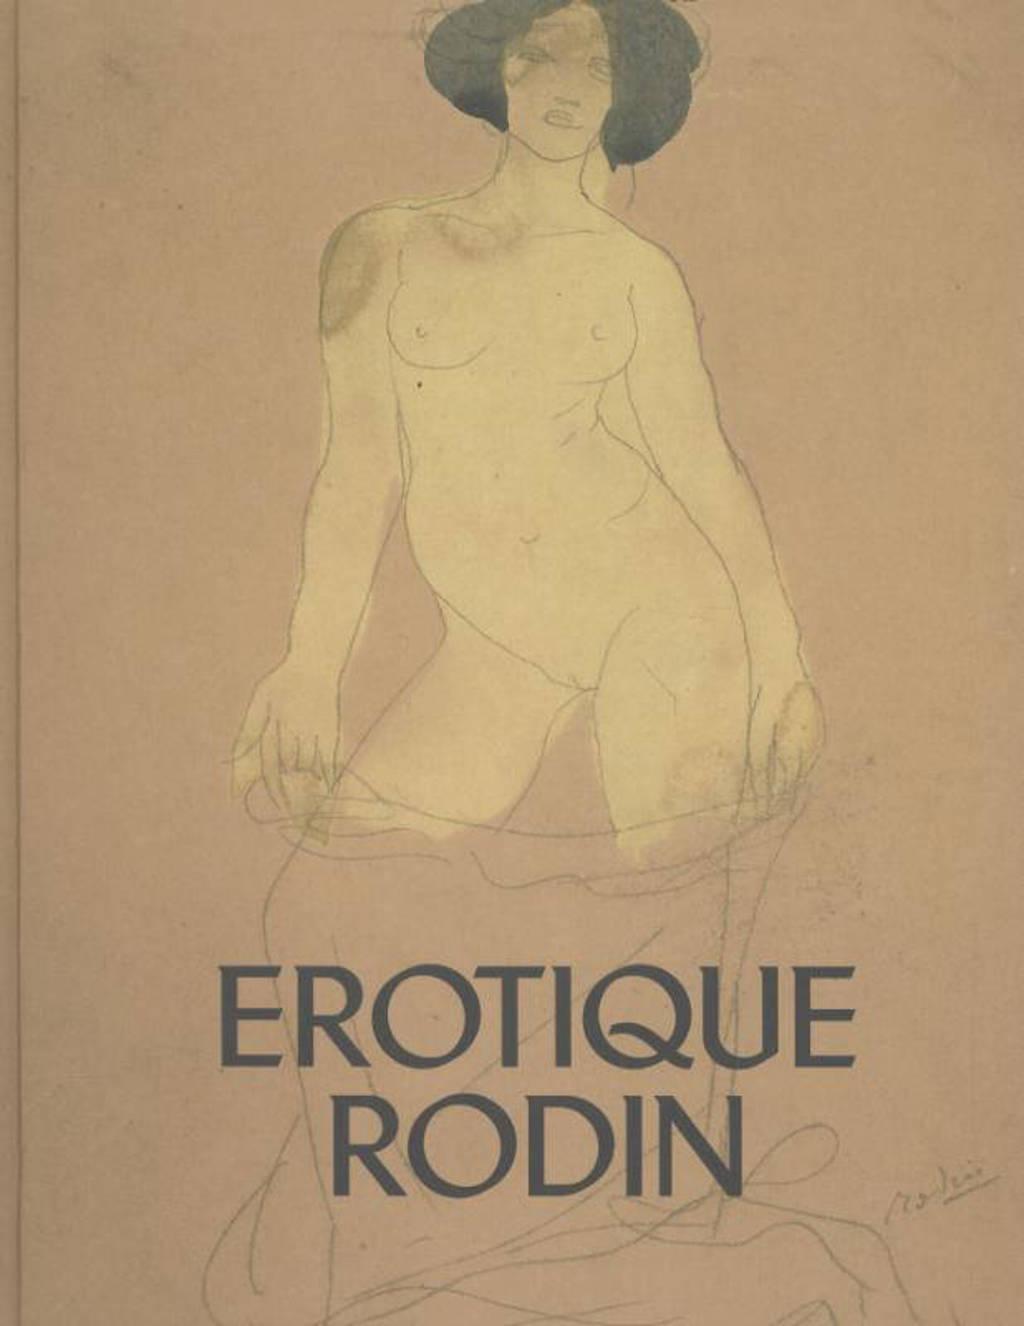 Erotique Rodin - Nadine Lehni, Jan Rudolph de Lorm, Helene Pinet, e.a.